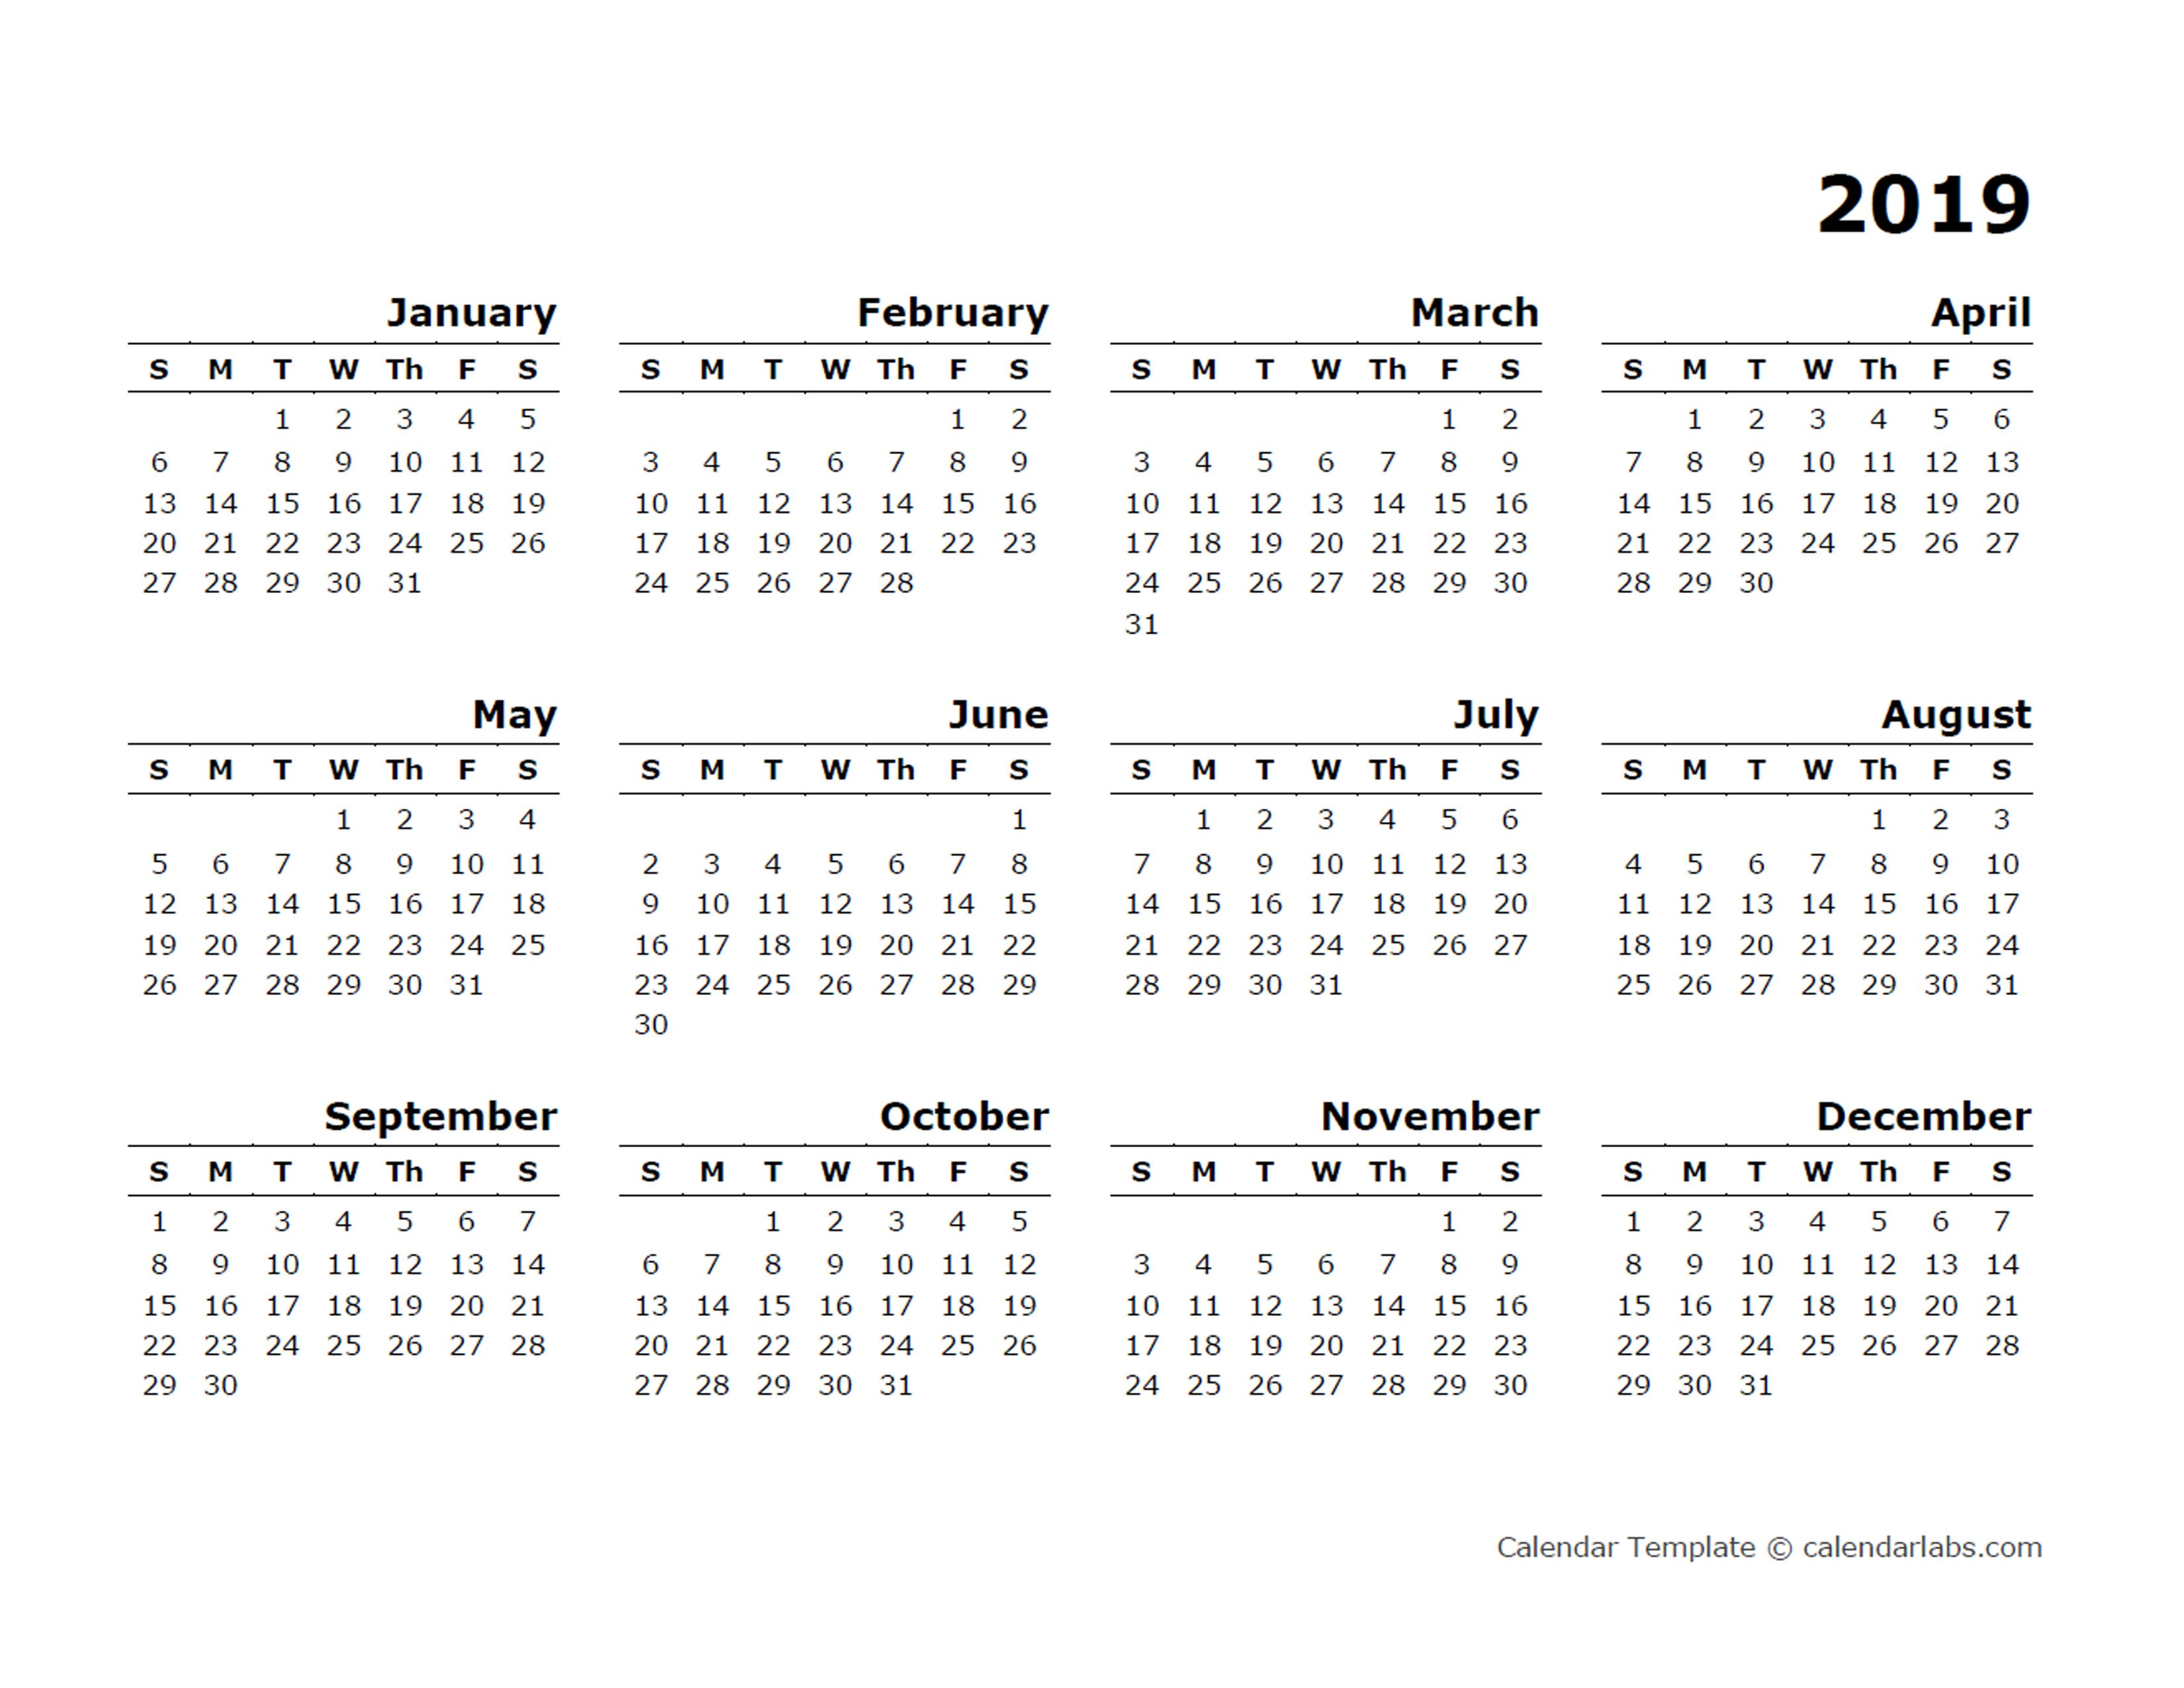 2019-2019 Calendar Printable 2019 Yearly Calendar Blank Minimal Design Free Printable